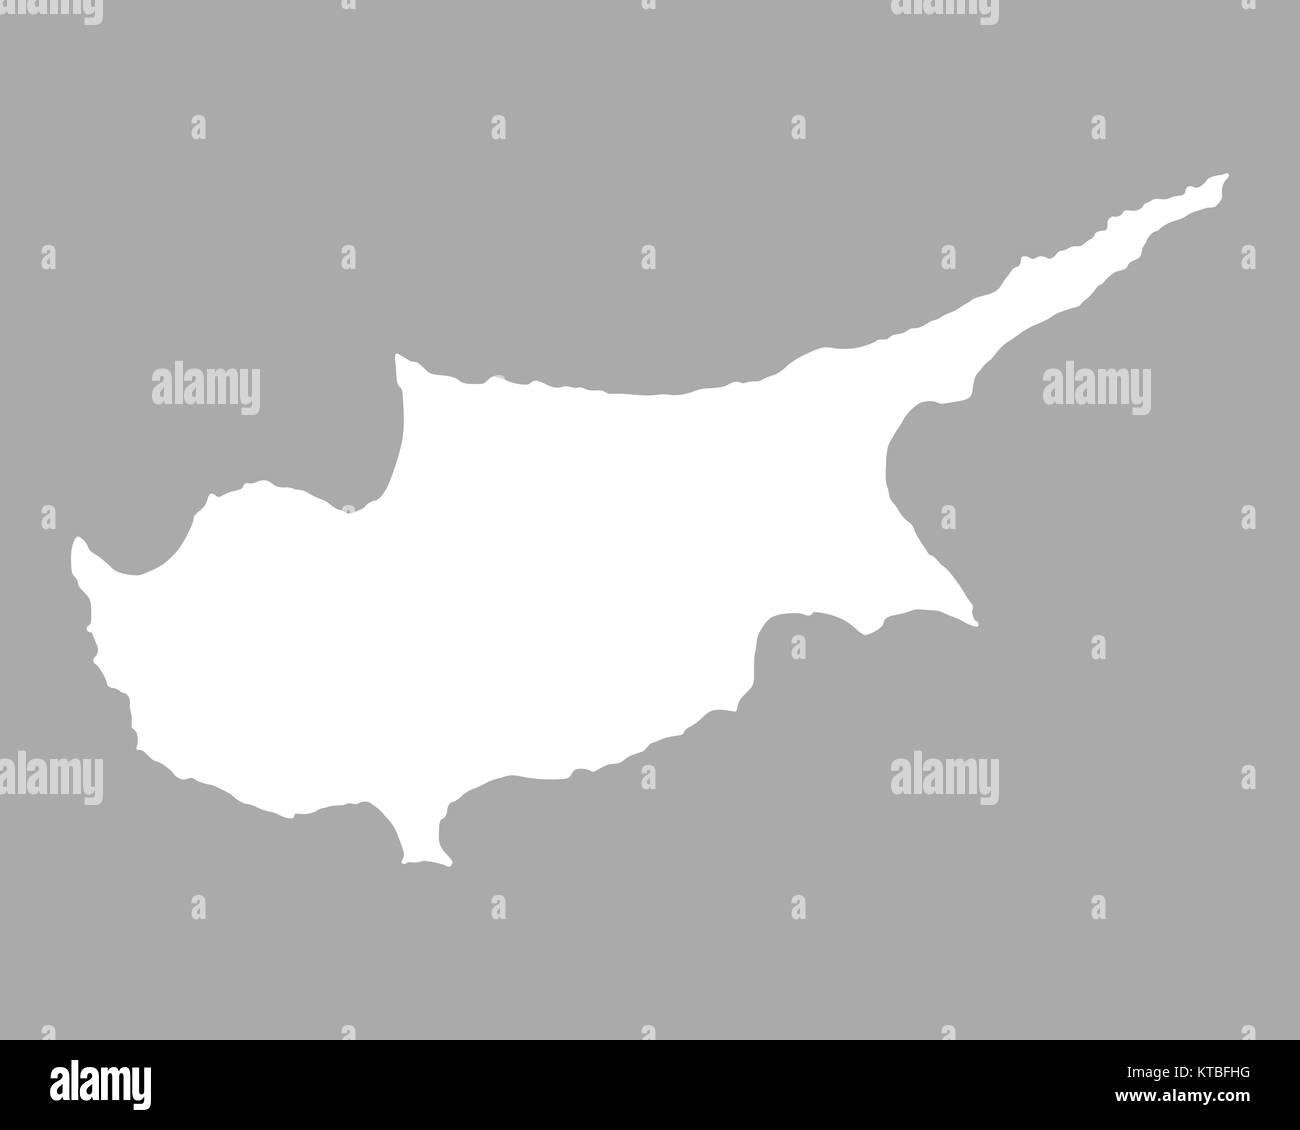 Karte Von Zypern Stock Photo 169898780 Alamy